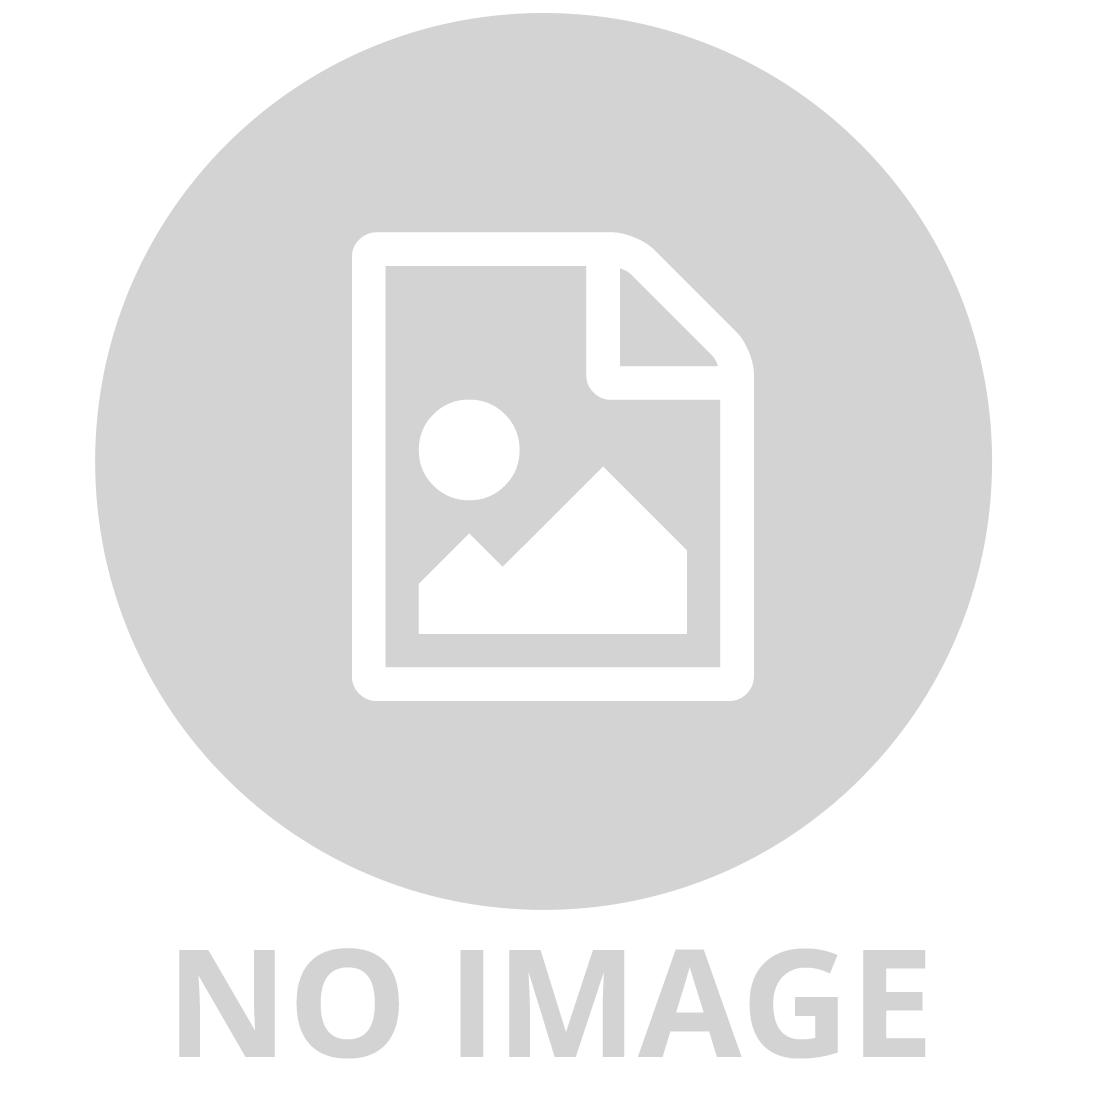 RUBIK S 2 X 2 CUBE